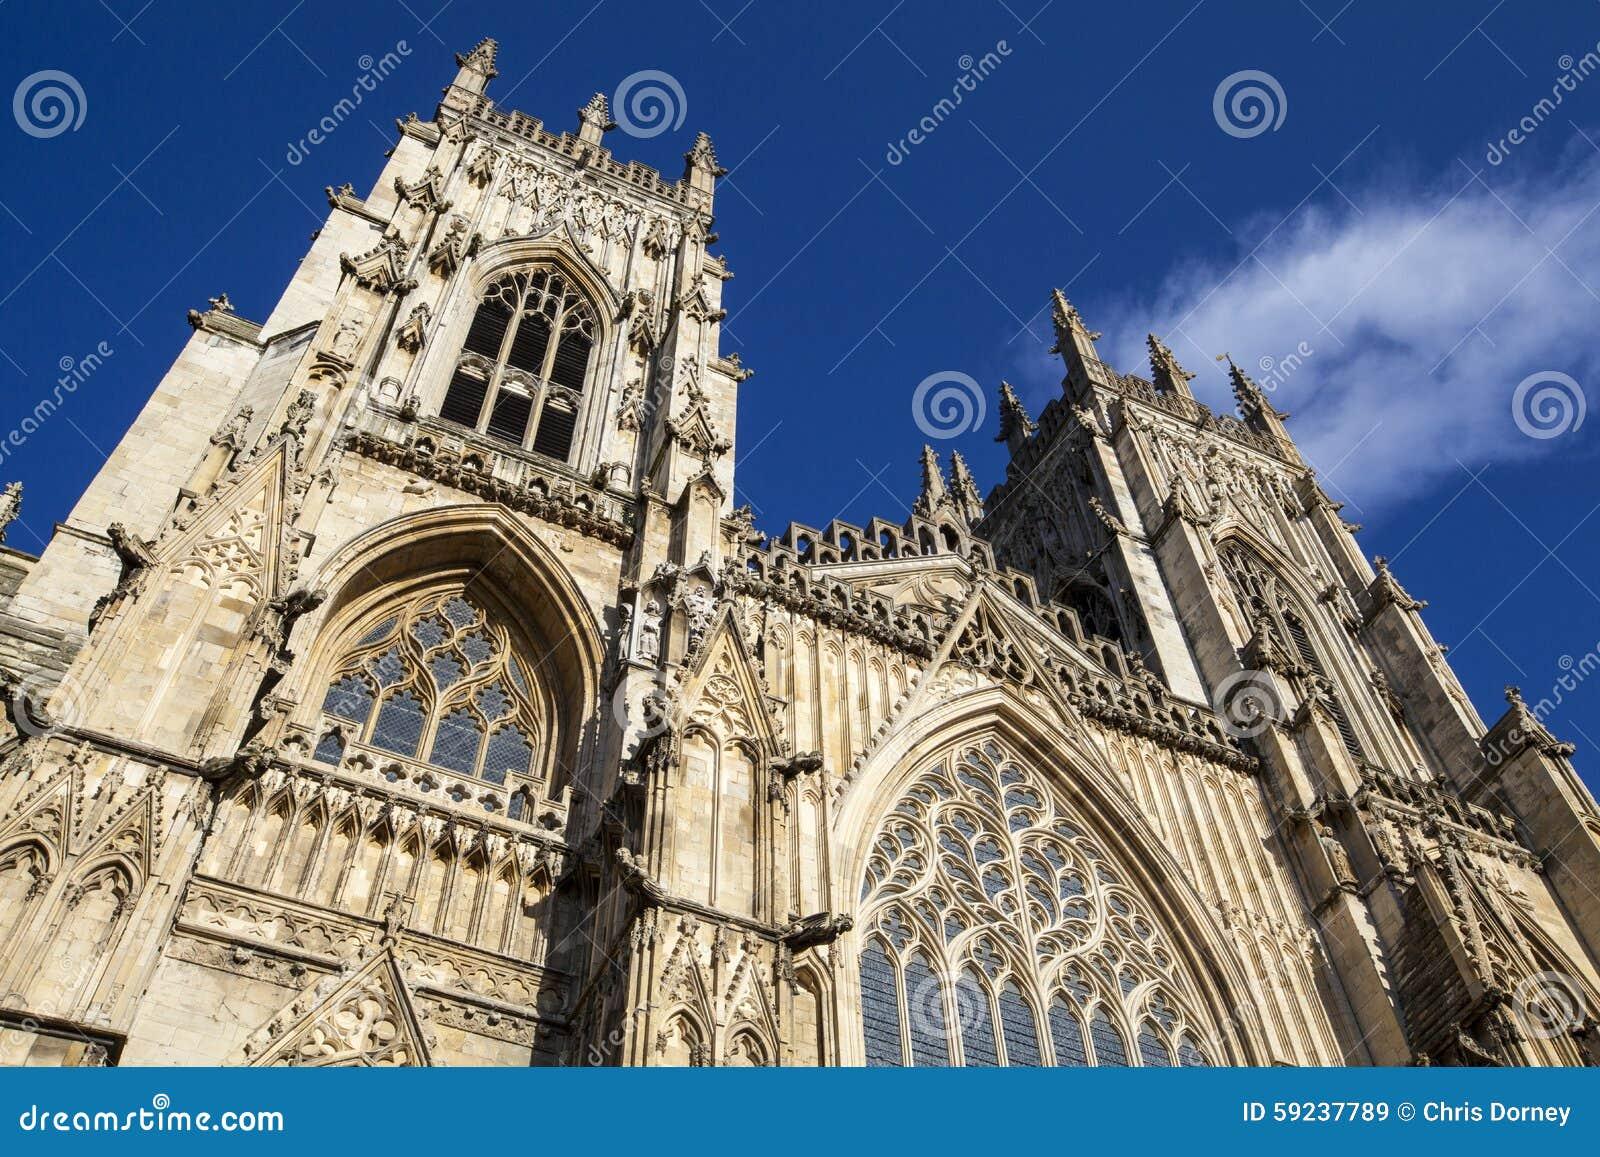 Download Iglesia De Monasterio De York Imagen de archivo - Imagen de iglesia, exterior: 59237789